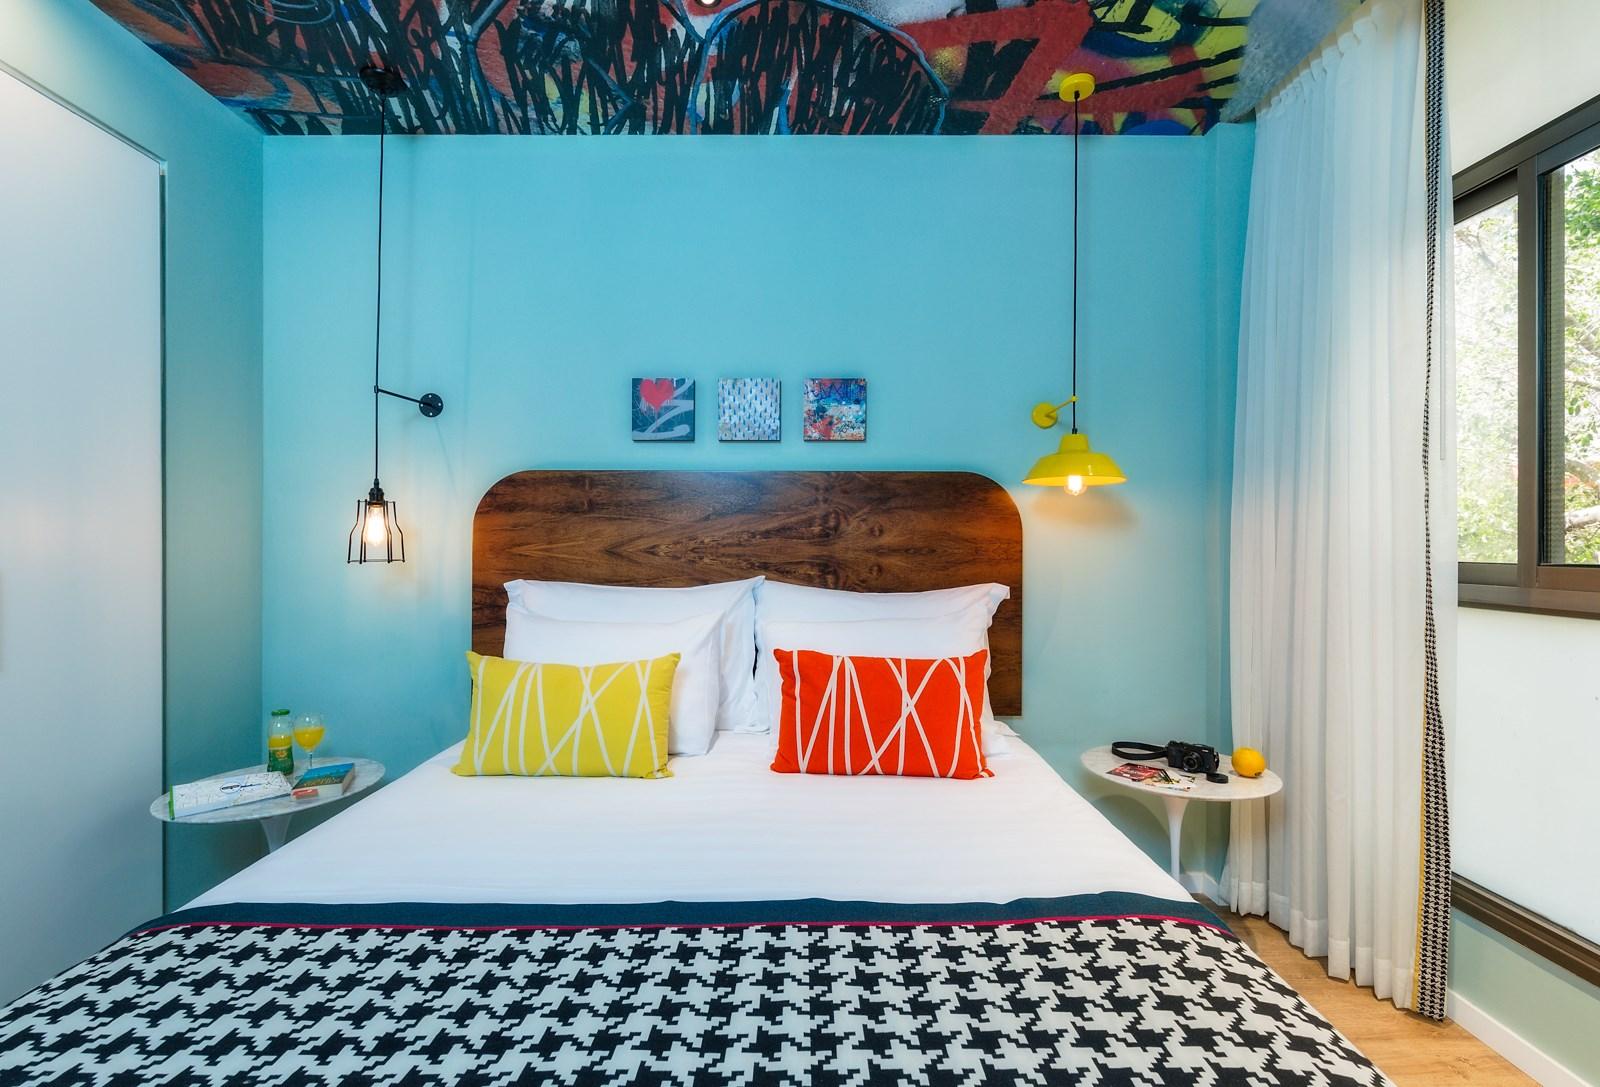 Hotel 75 - Urban Room